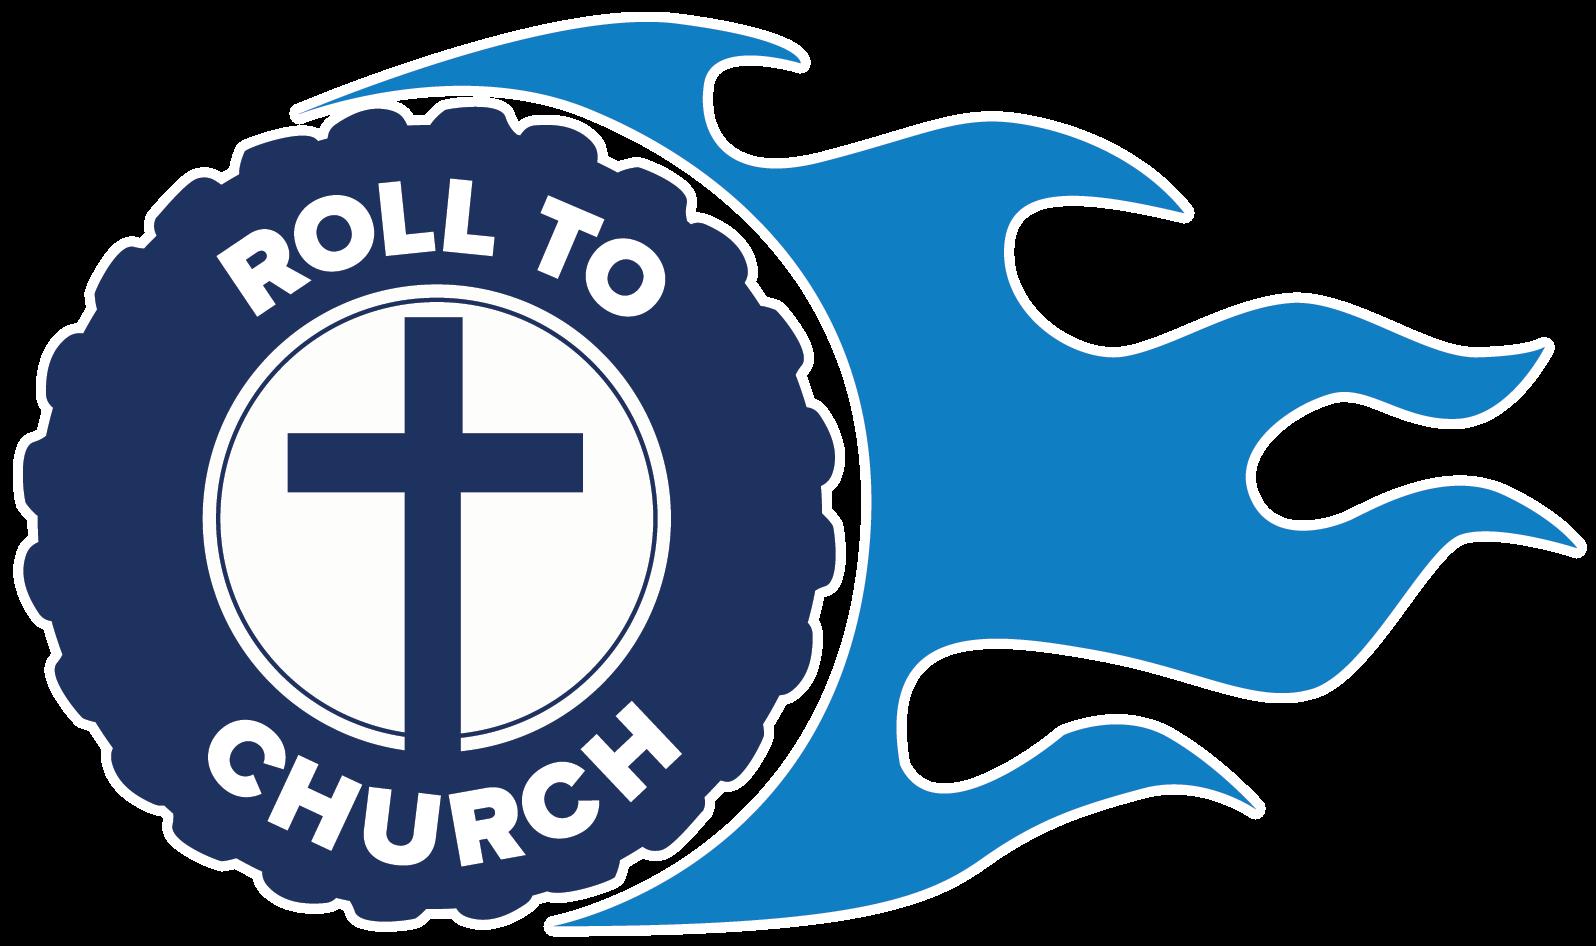 Roll To Church